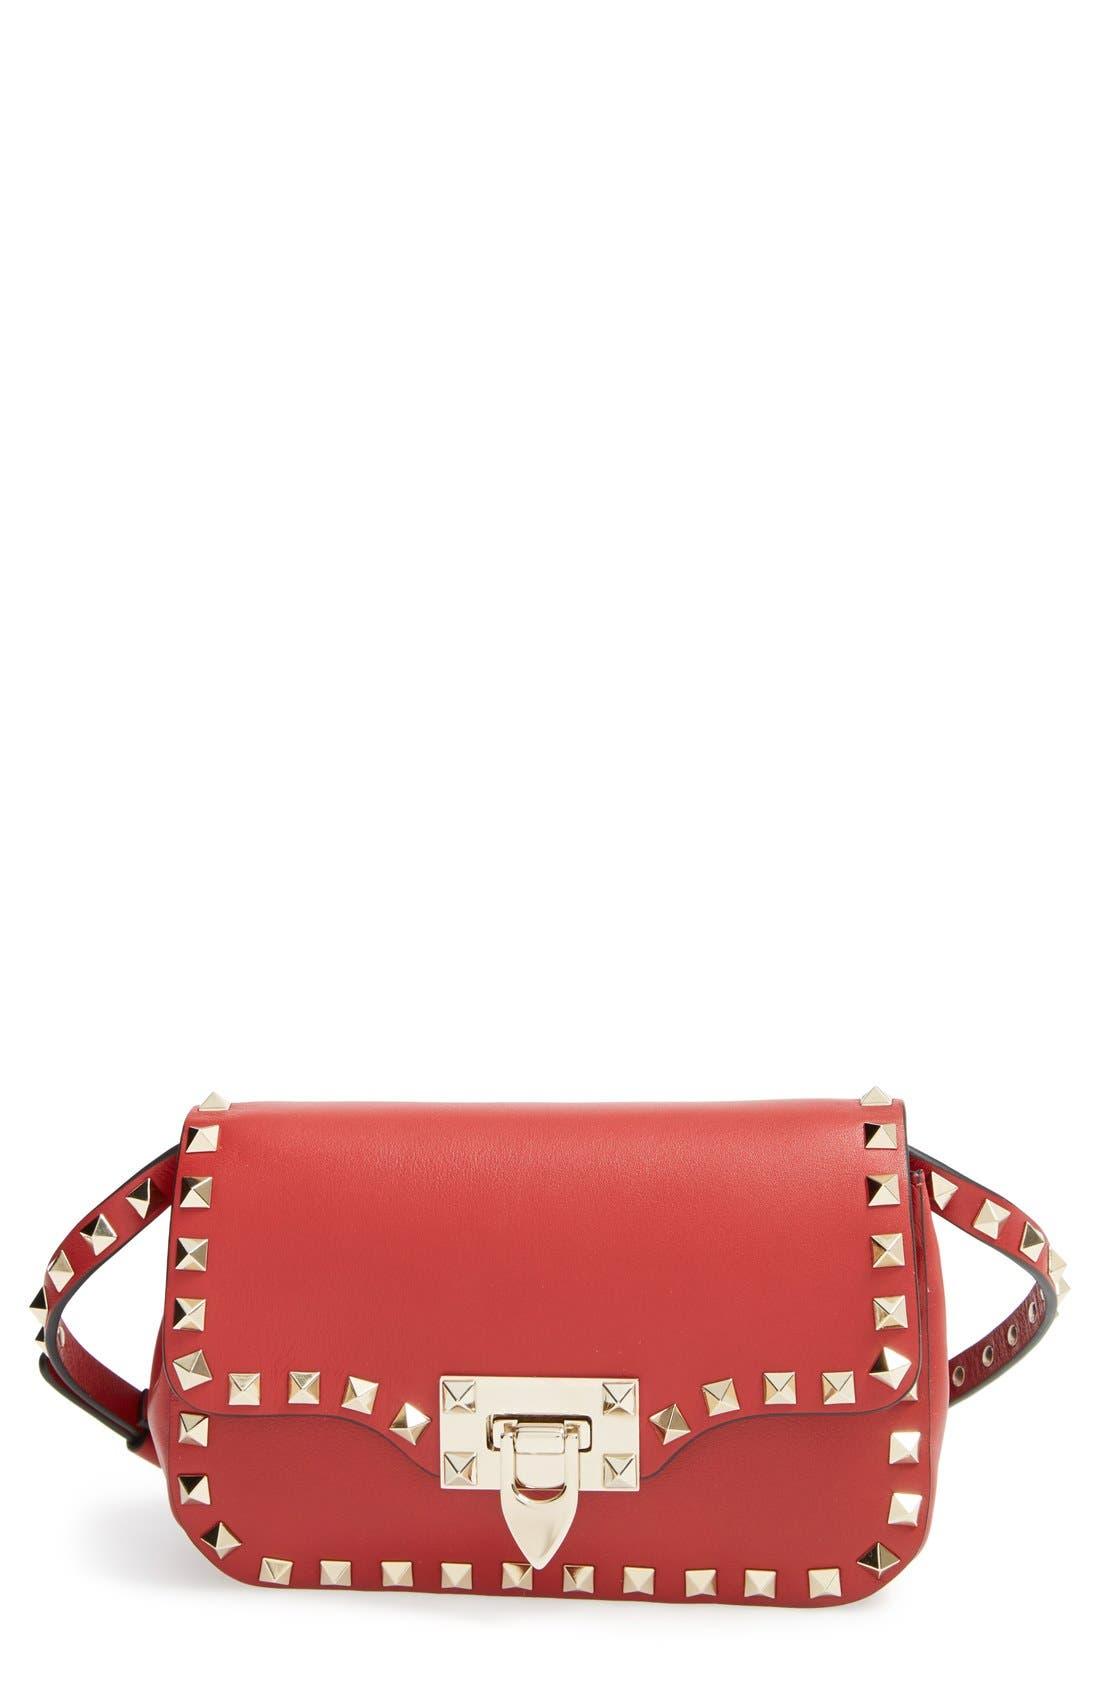 Main Image - Valentino 'Mini Rockstud' Crossbody Bag